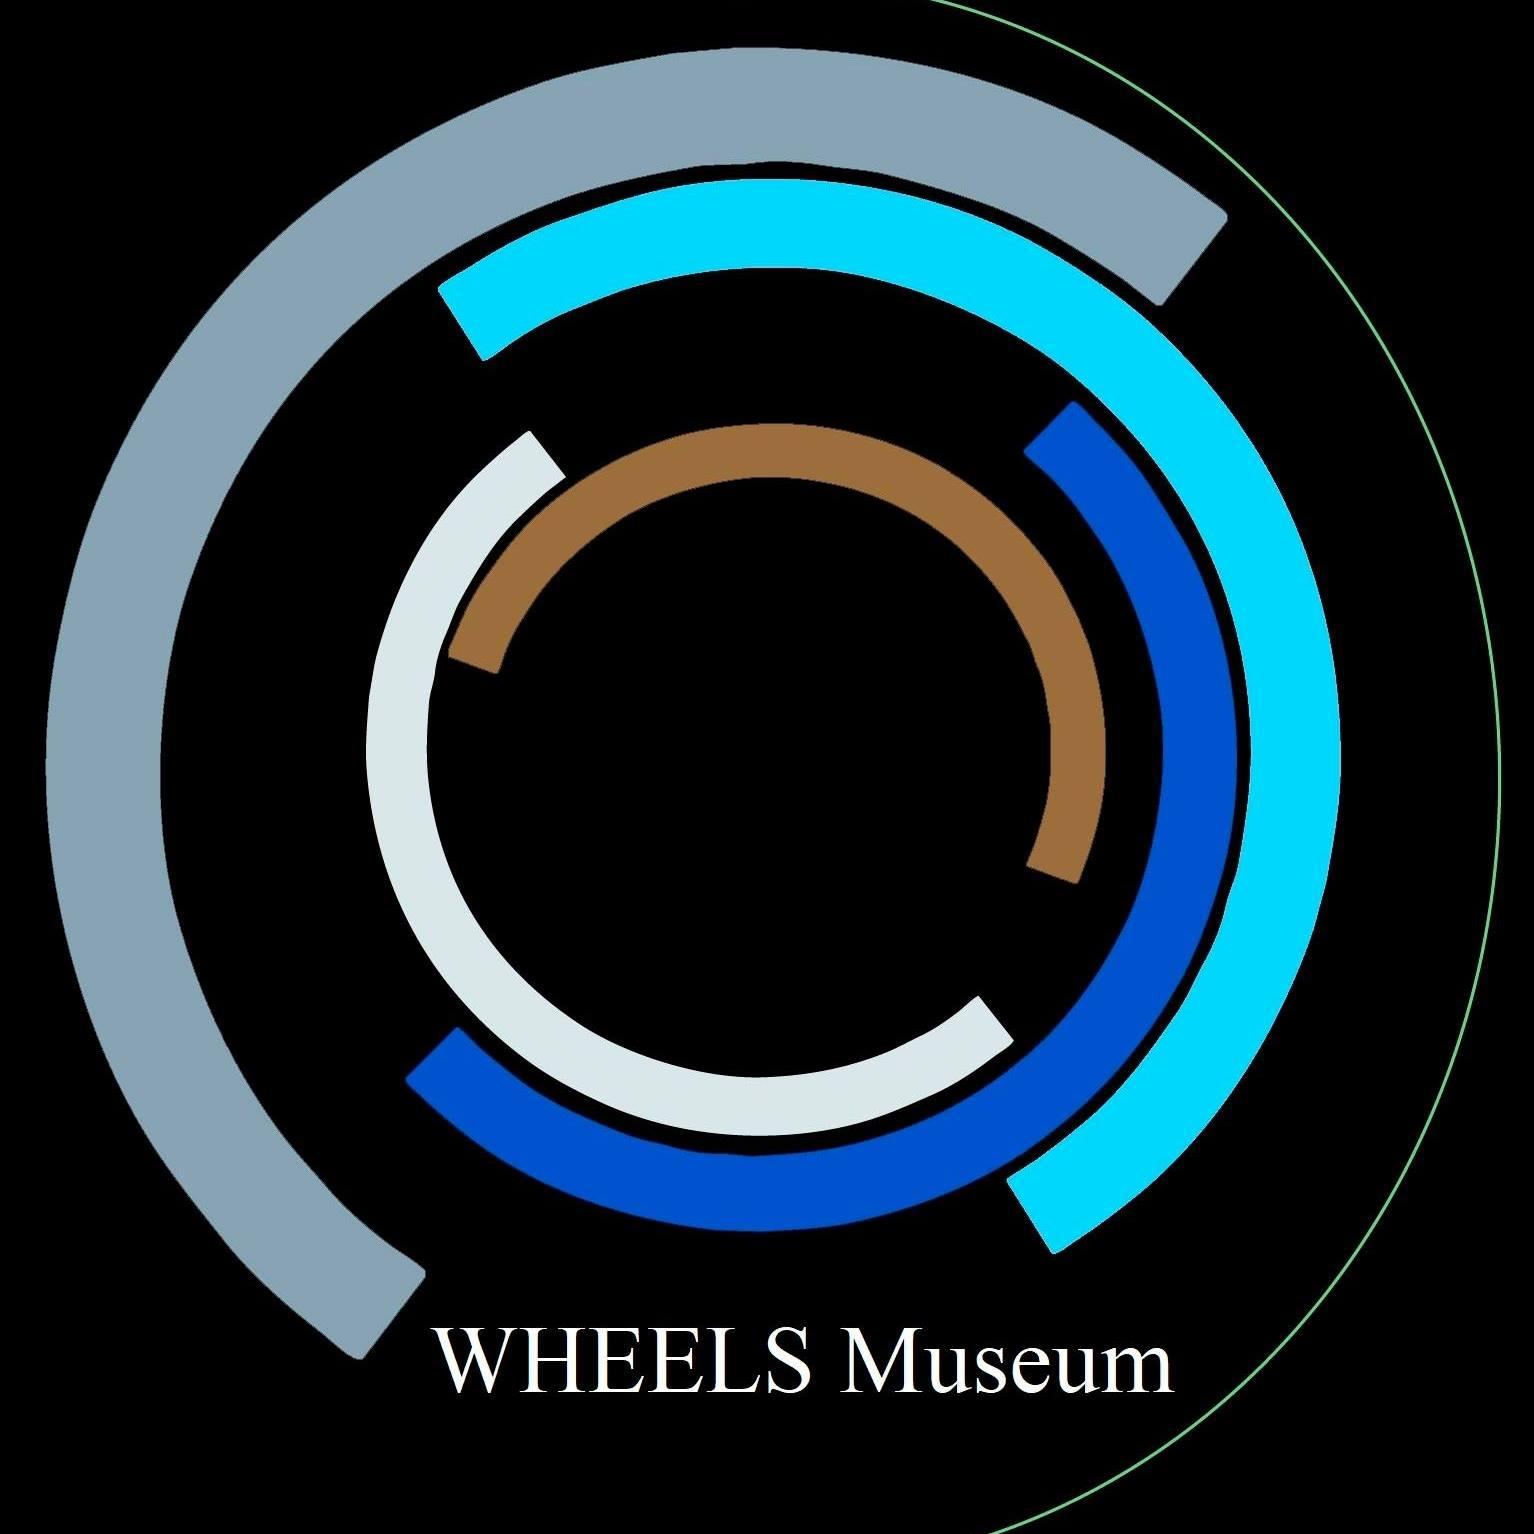 Wheels Museum Logo